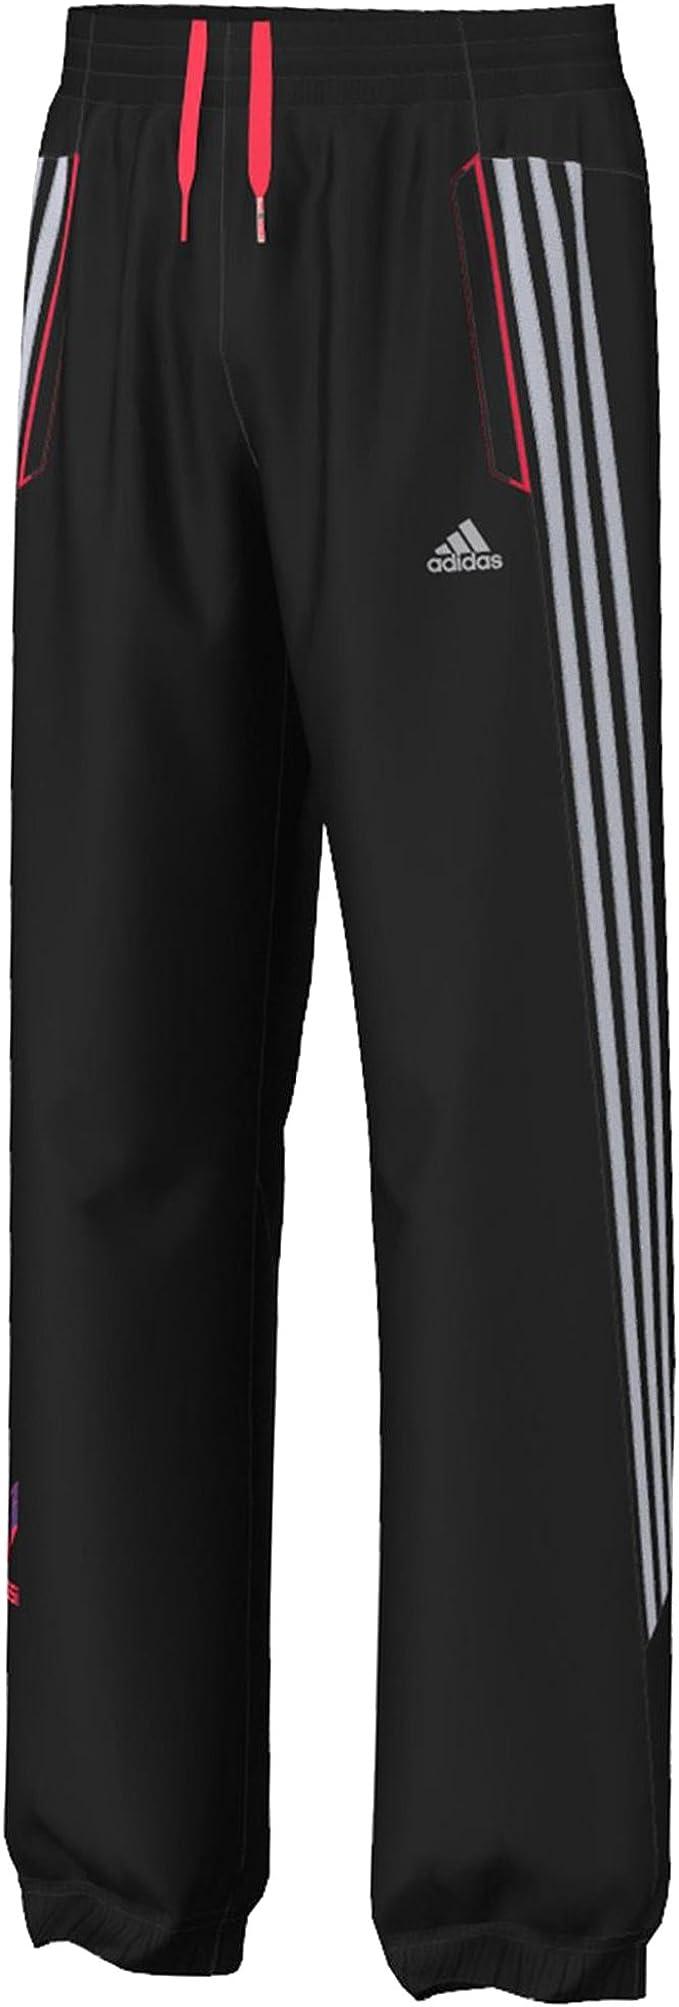 jogging adidas 5-6 ans